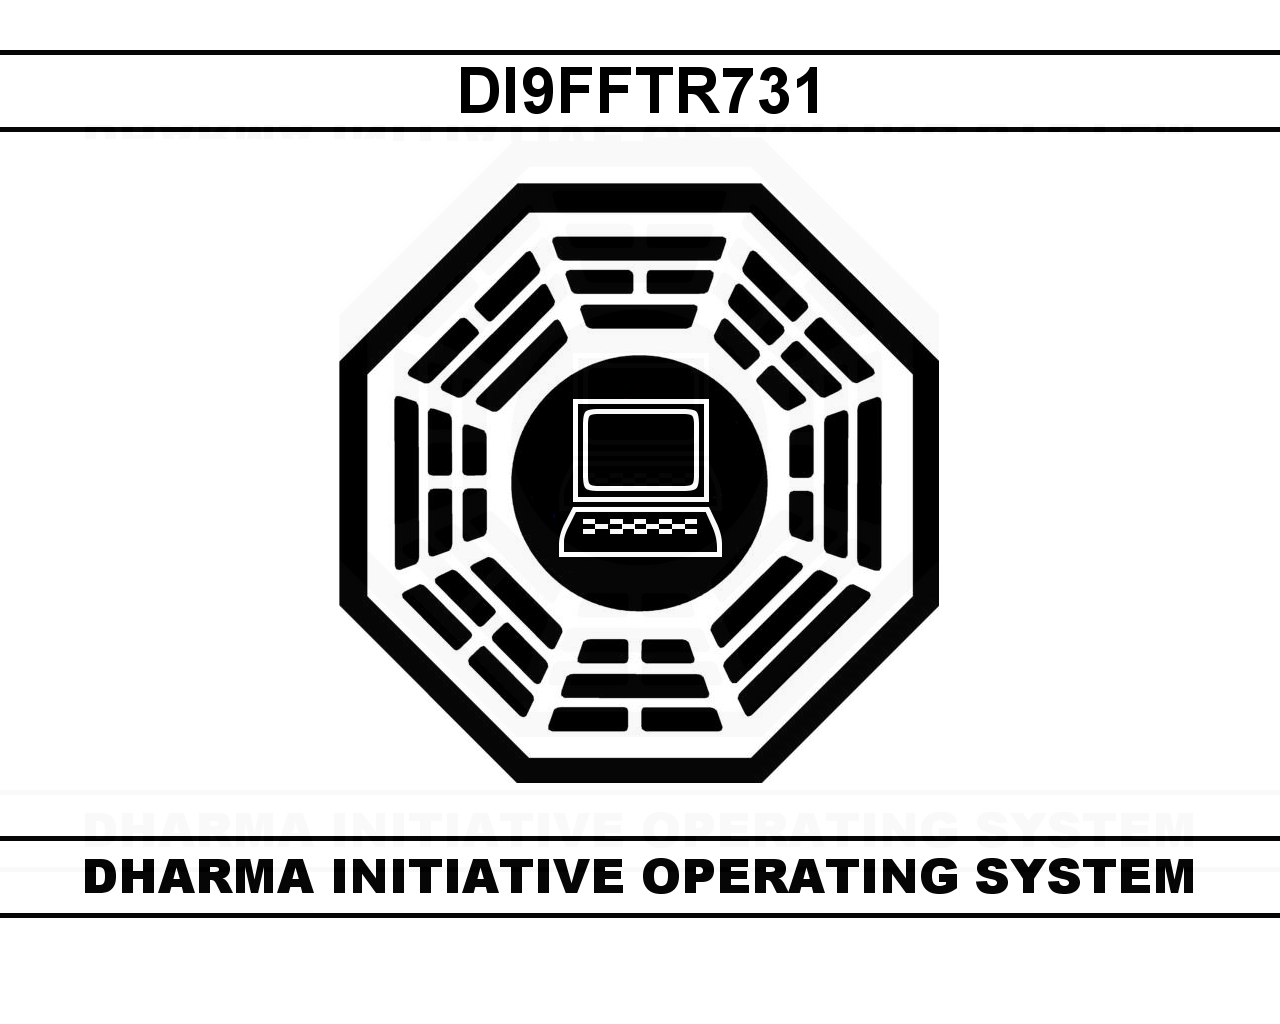 Dharma Initiative OS by damndirtyape